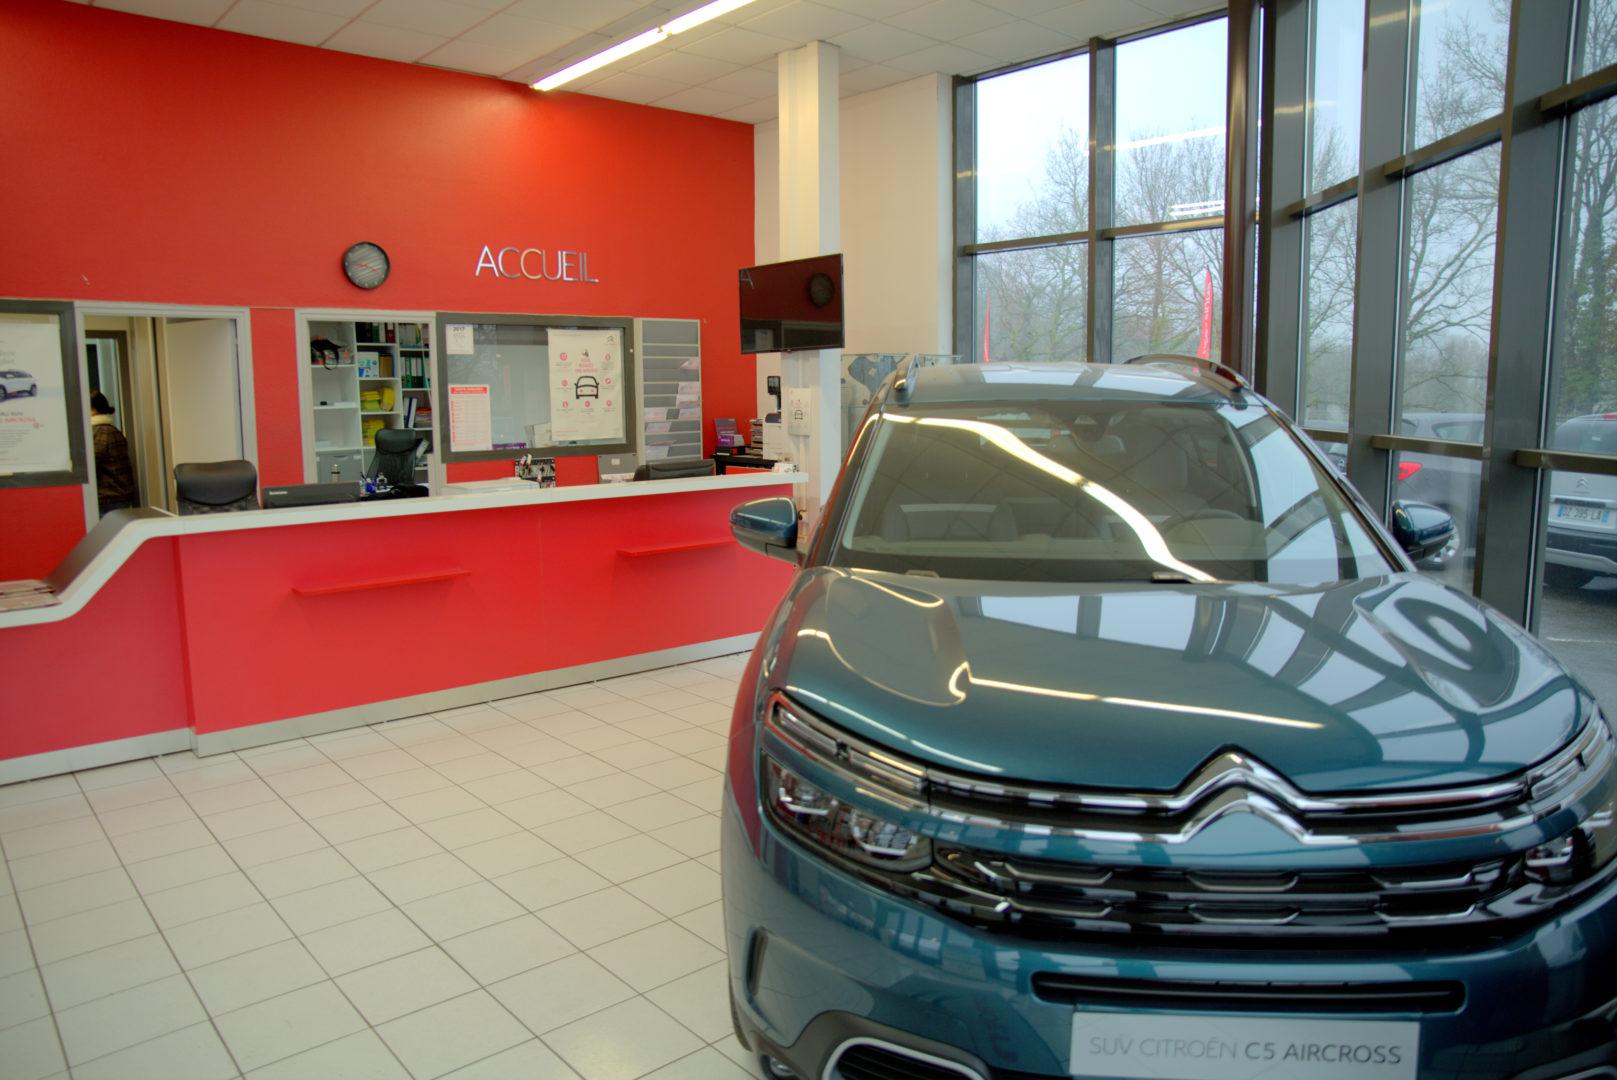 Accueil Garage Citroën Quimper 2 - Carrosserie